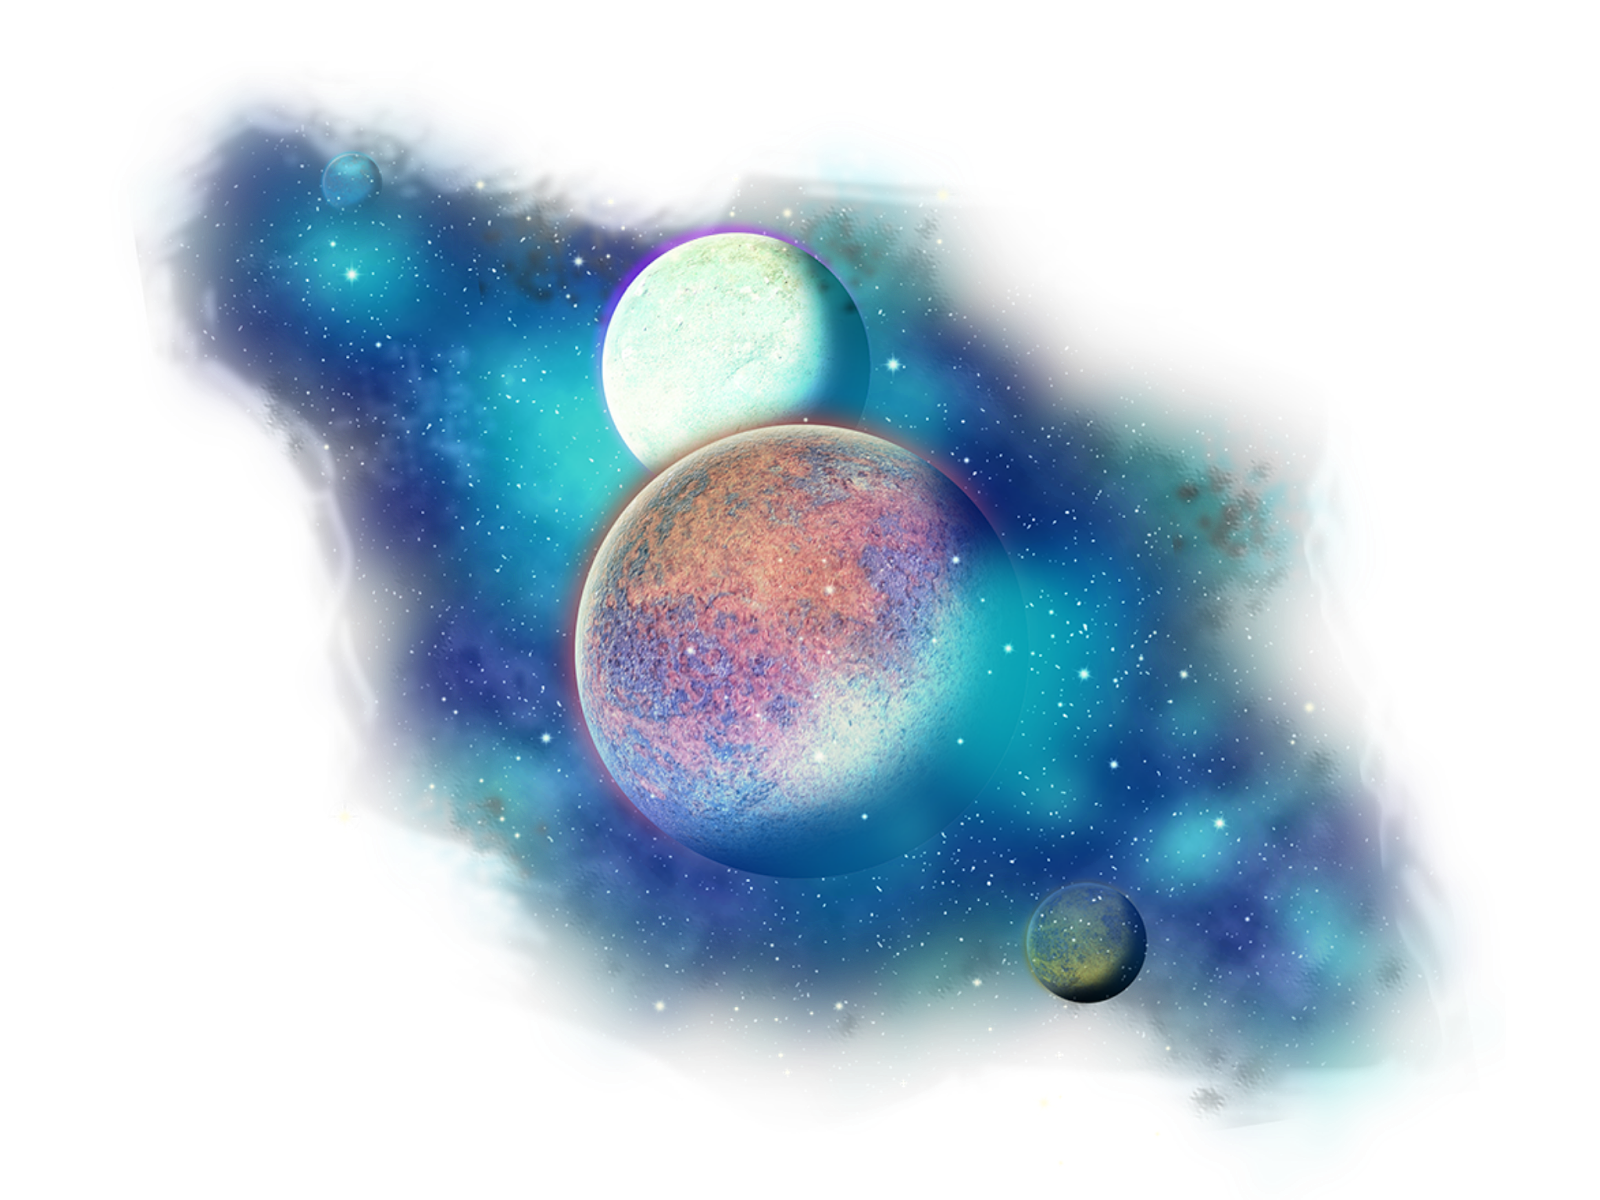 Galaxy clipart 9 planet. Star clip art space